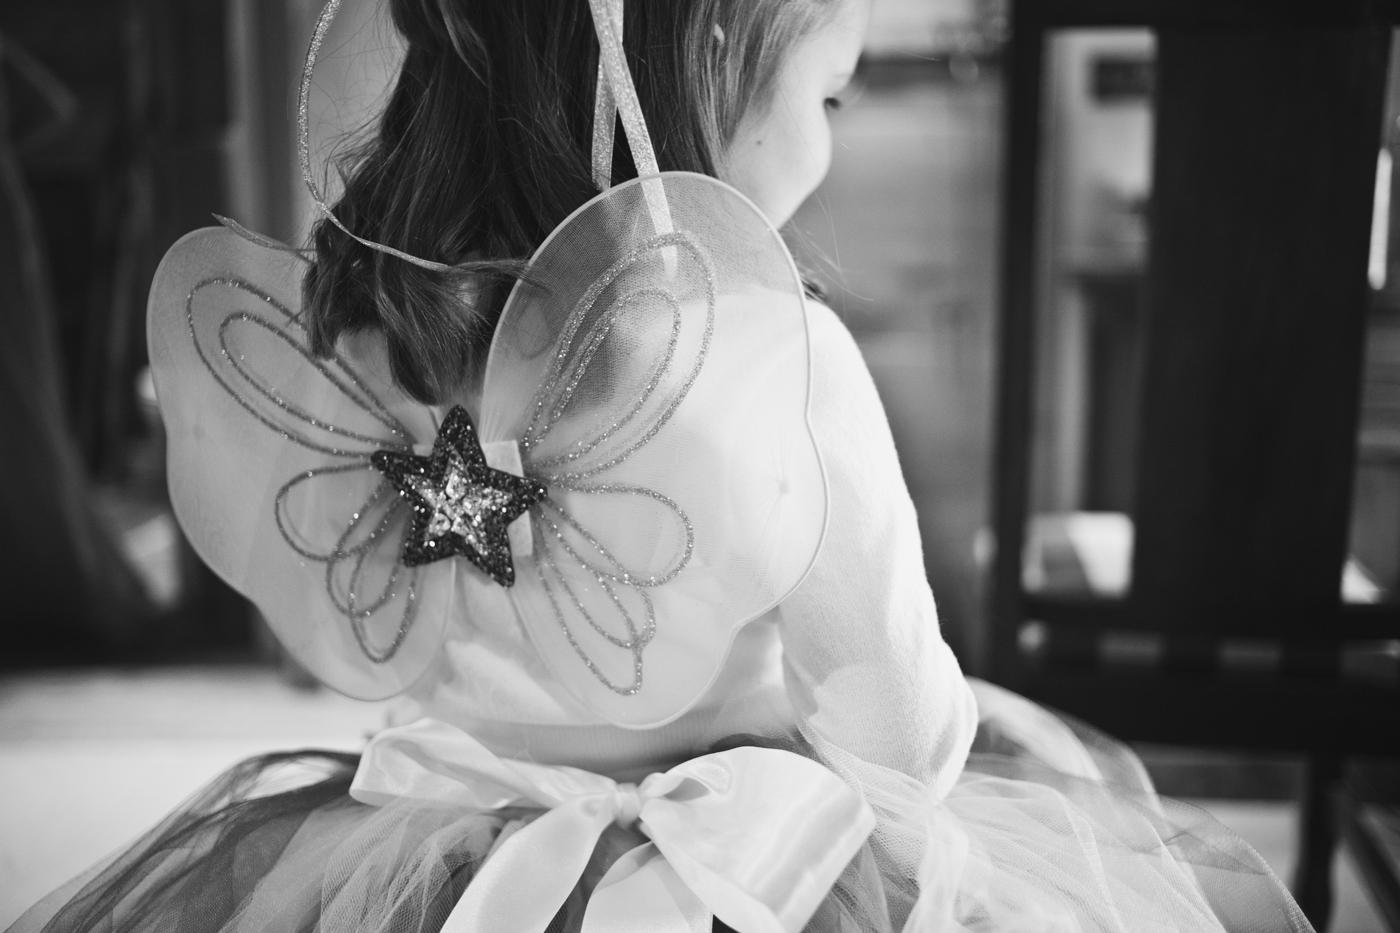 star-inn-harome-north-yorkshire-teesside-wedding-photography-0001.jpg